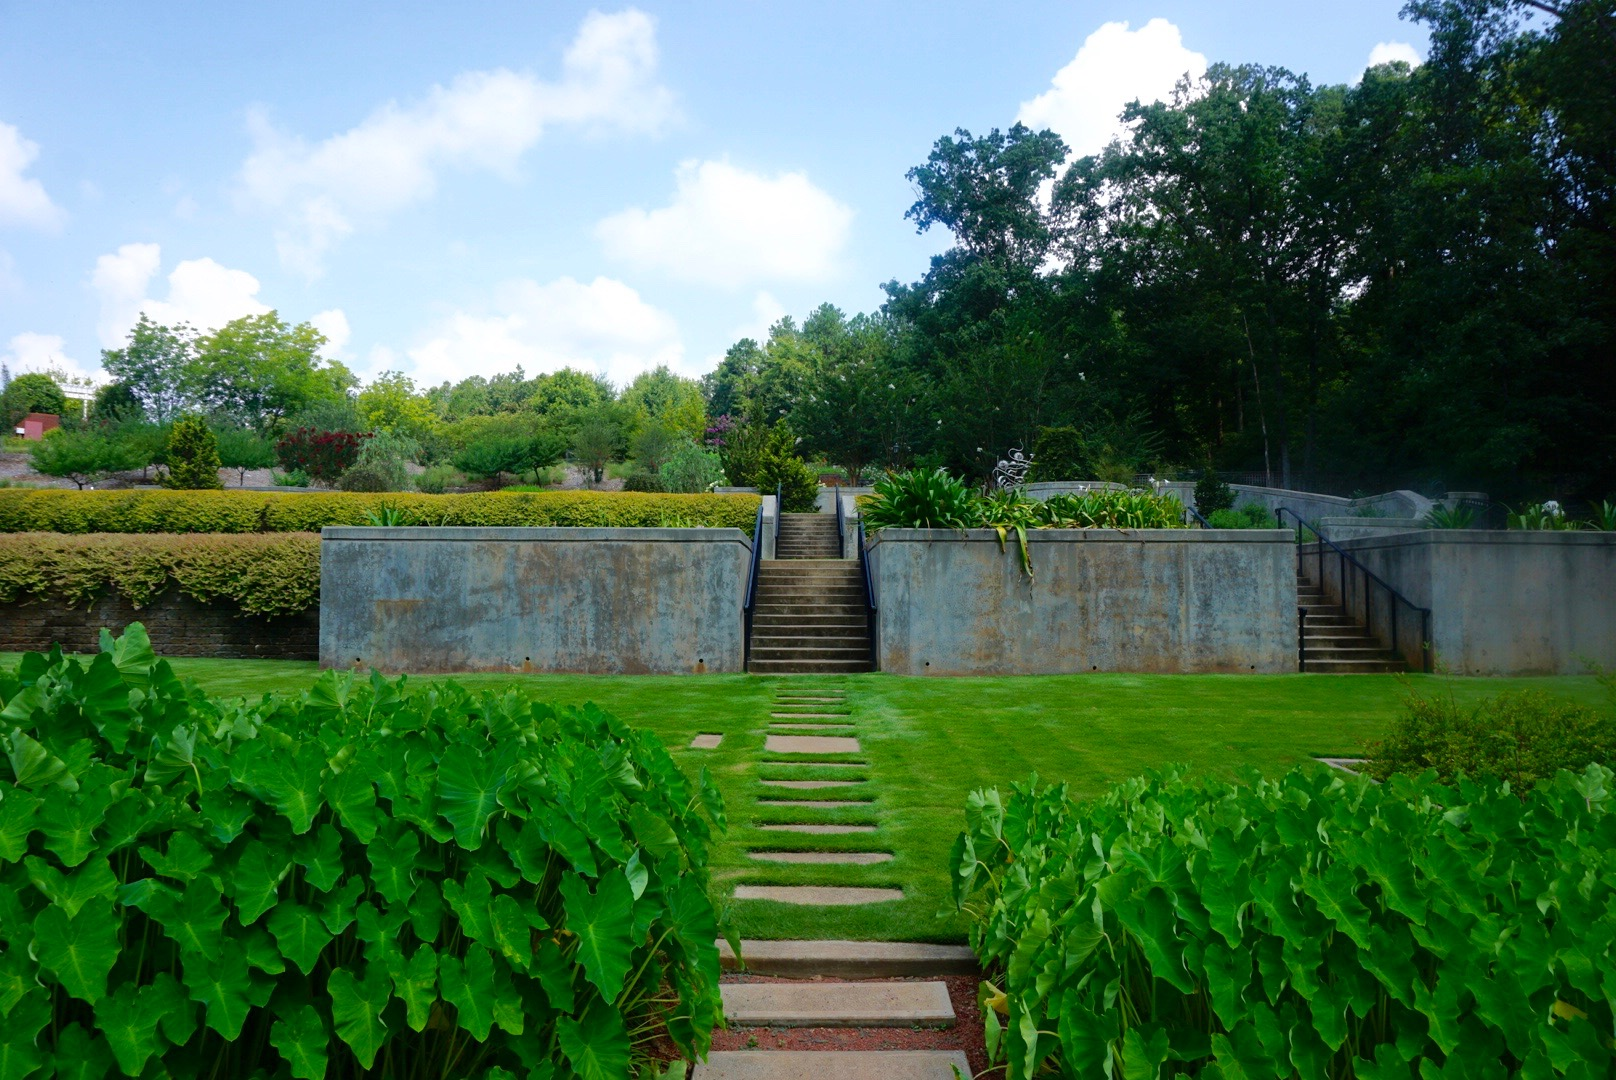 State of Georgia Botanical Gardens, Athens, Georgia